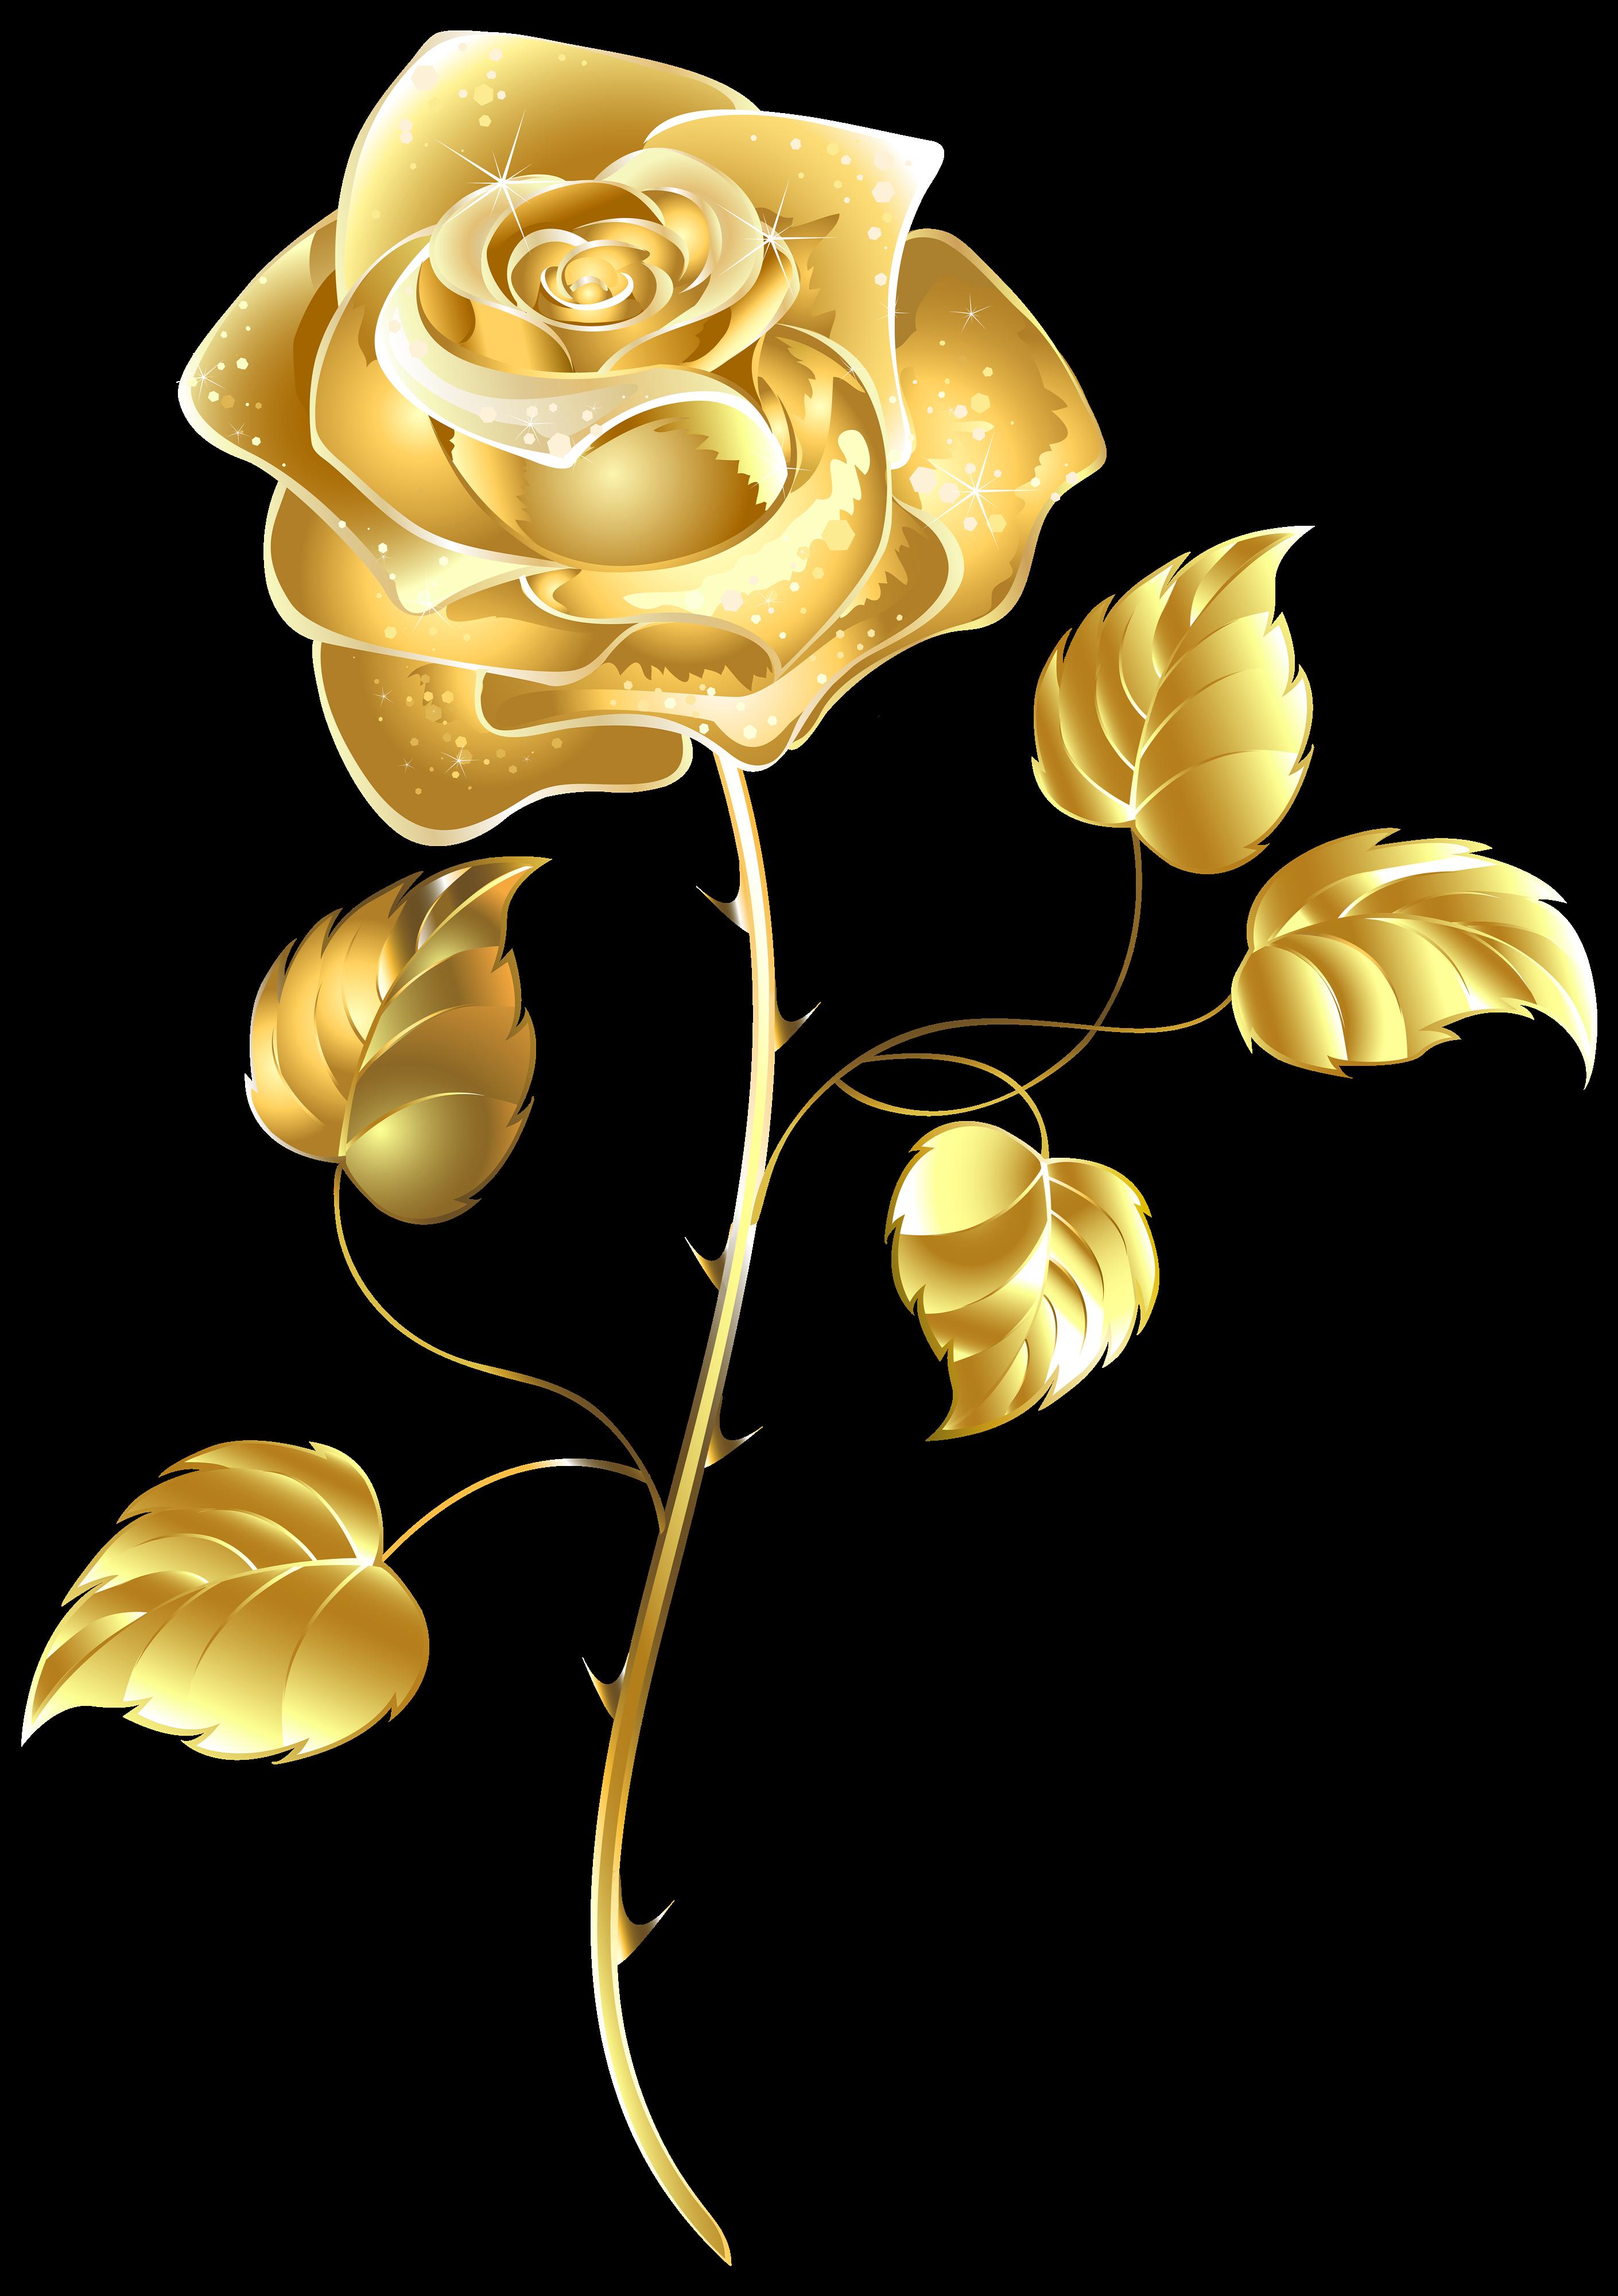 Golden Rose PNG Transparent Images, Pictures, Photos.